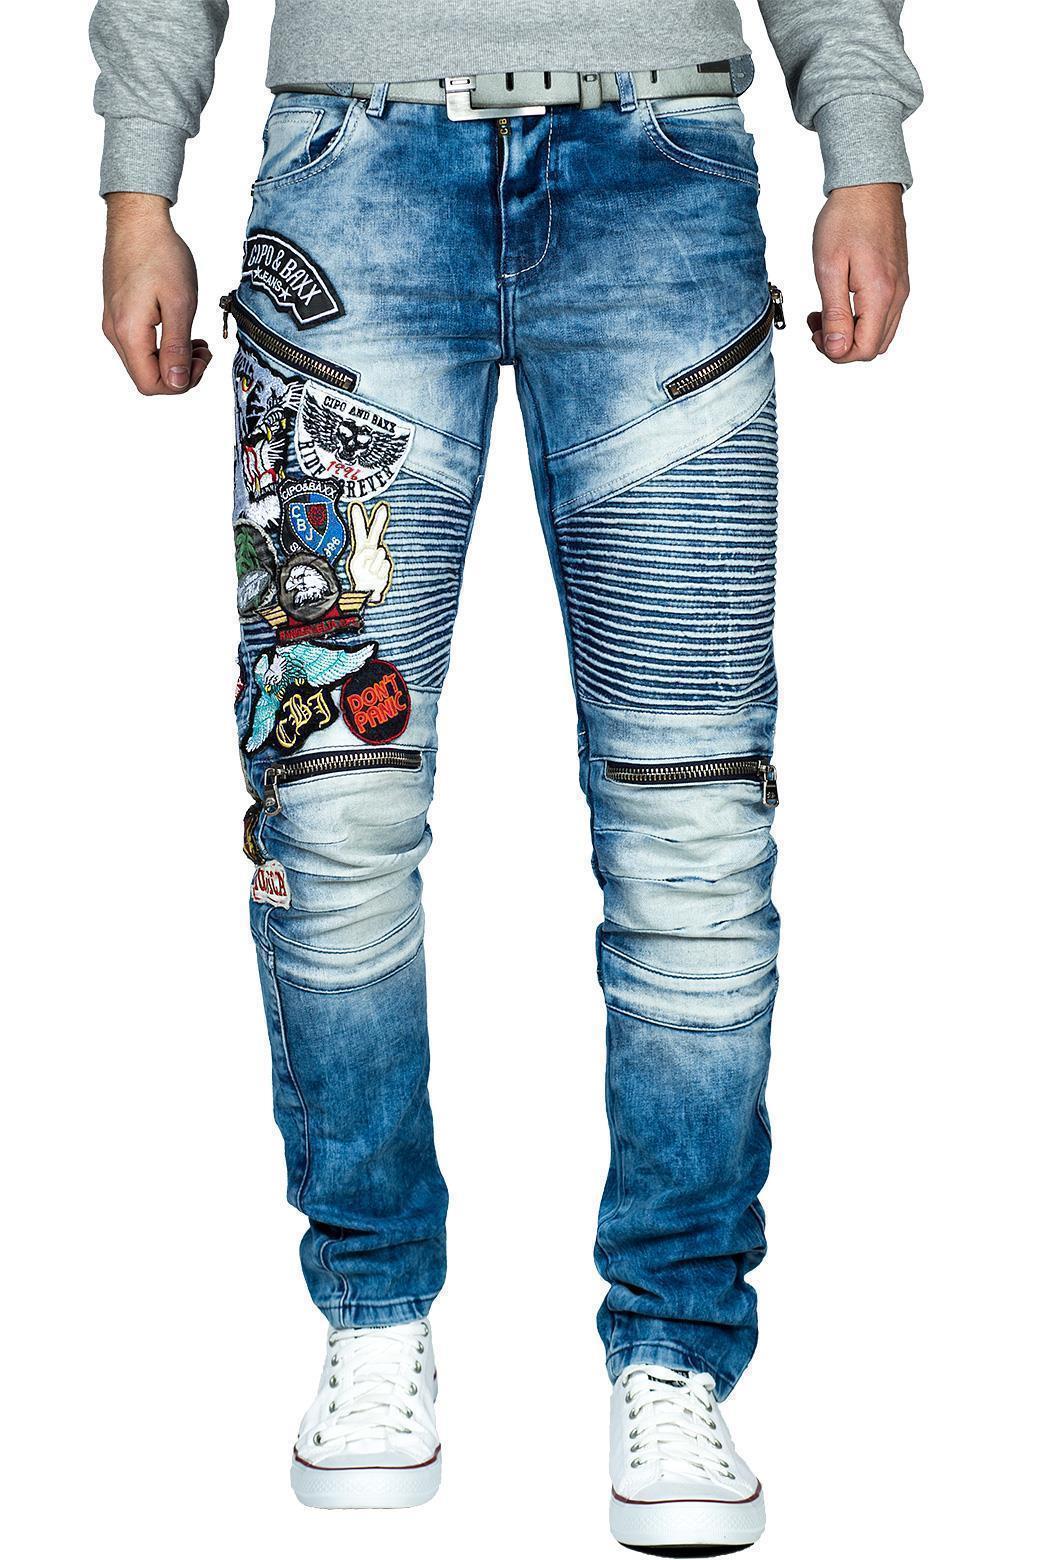 Cipo-amp-Baxx-Uomo-Jeans-Pantaloni-ricamate-Biker-Style-streetwear-nervature-pattern-Dope miniatura 34